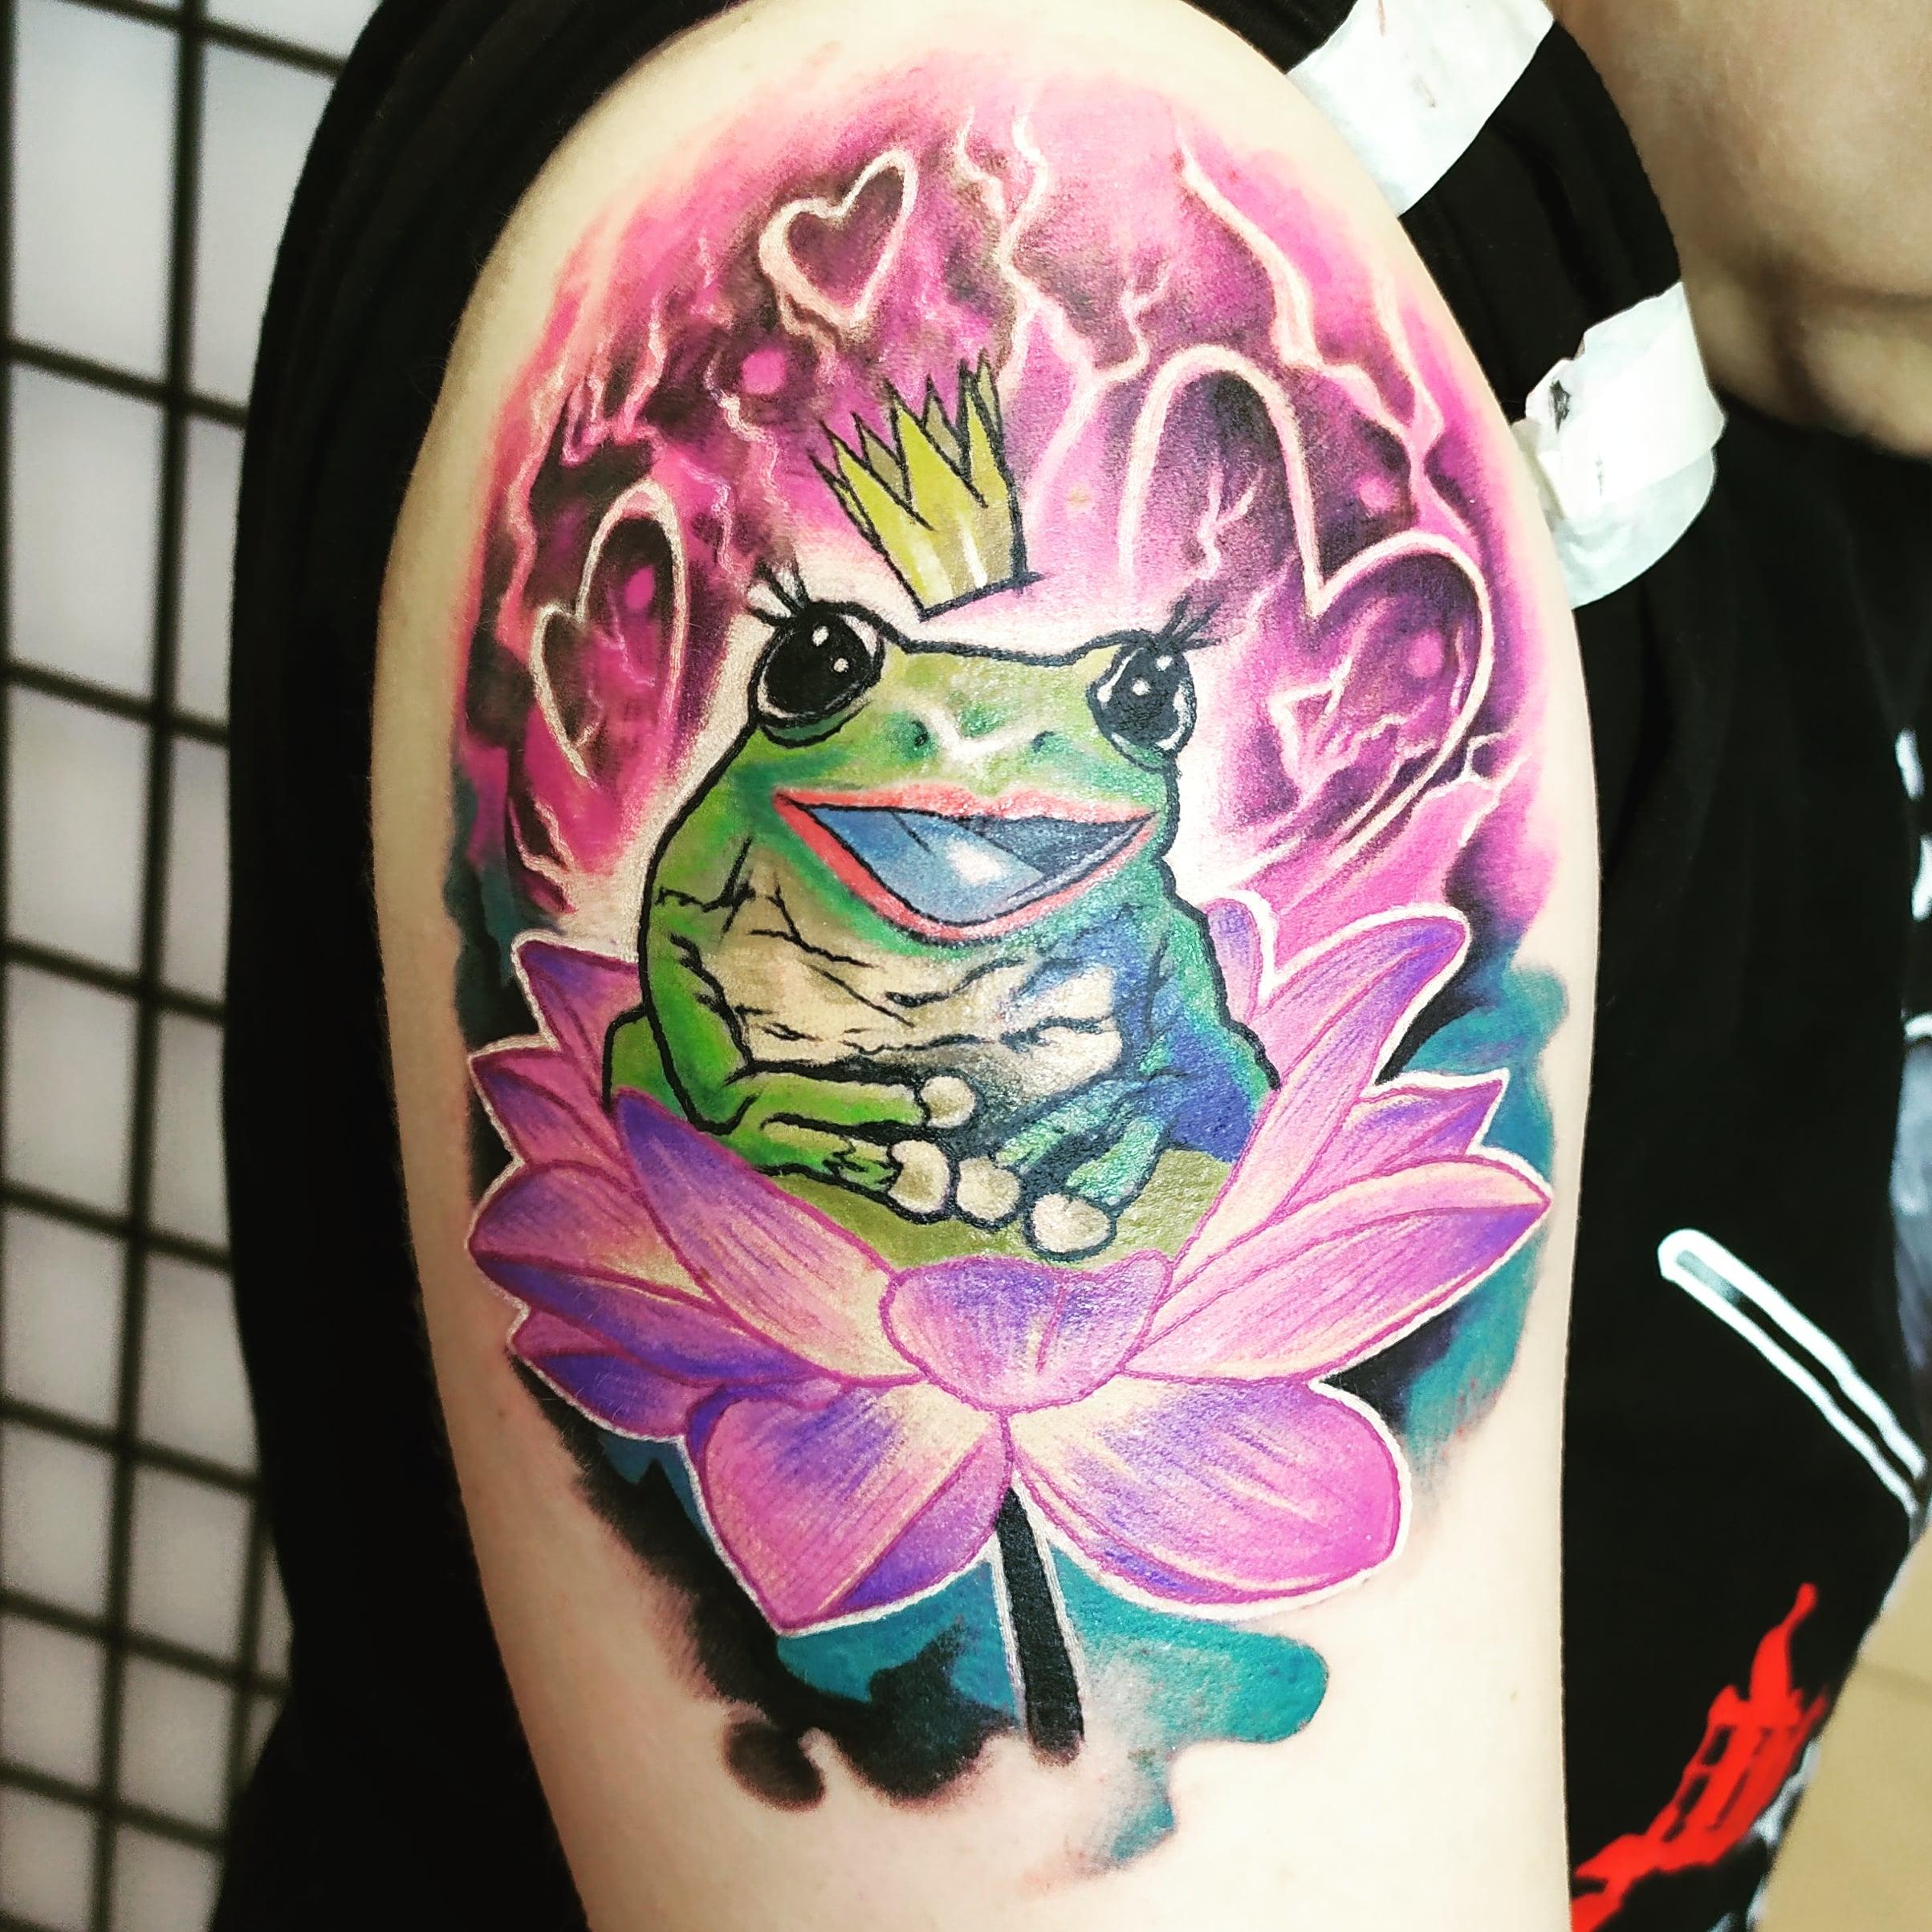 Inksearch tattoo Crystal Warhola